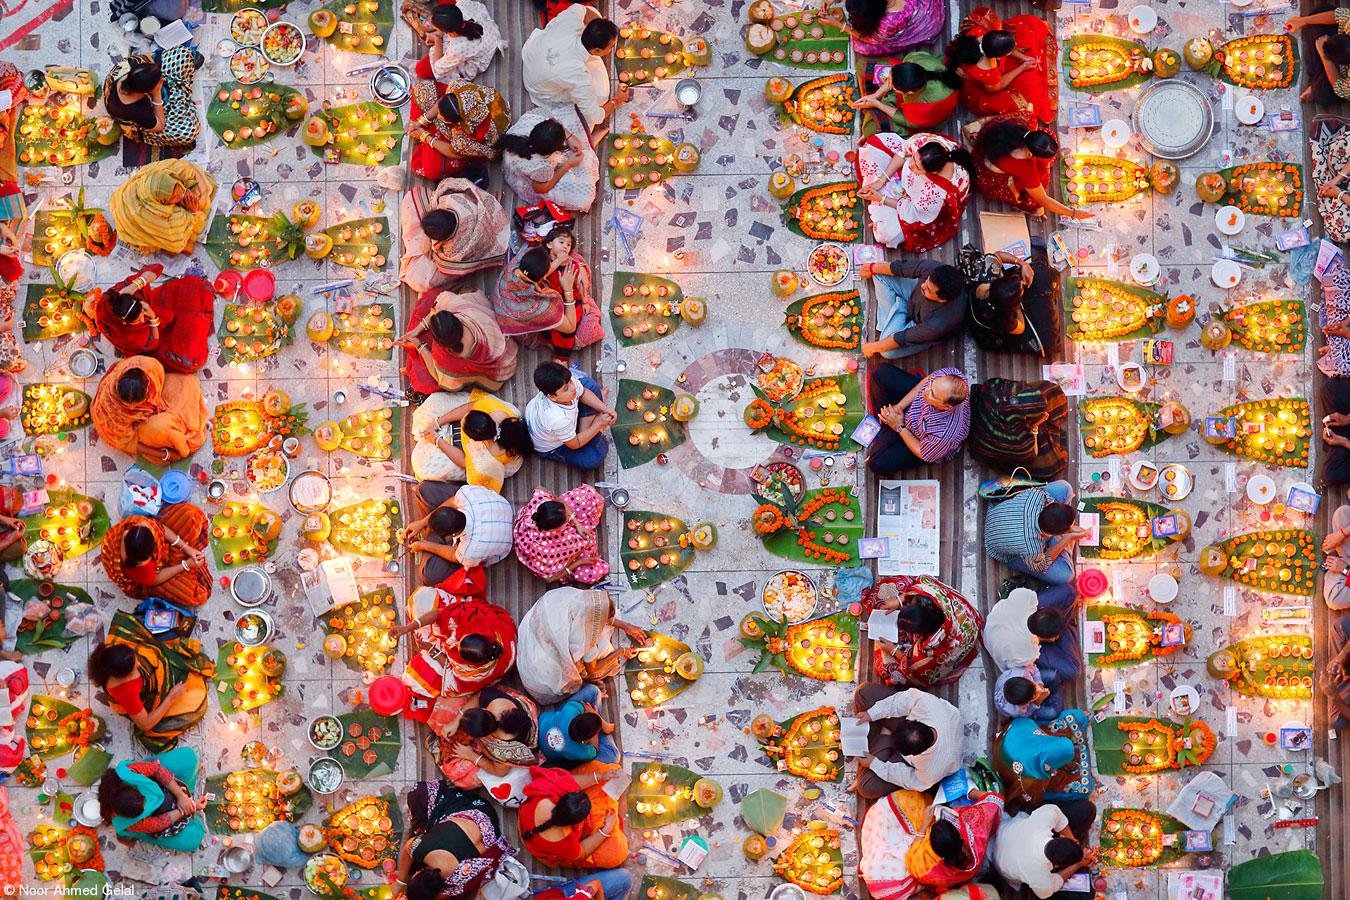 Молитва с едой, © Нур Ахмед Гелал, Бангладеш, 1-е место, категория «Еда для торжества», Фотоконкурс Pink Lady Food